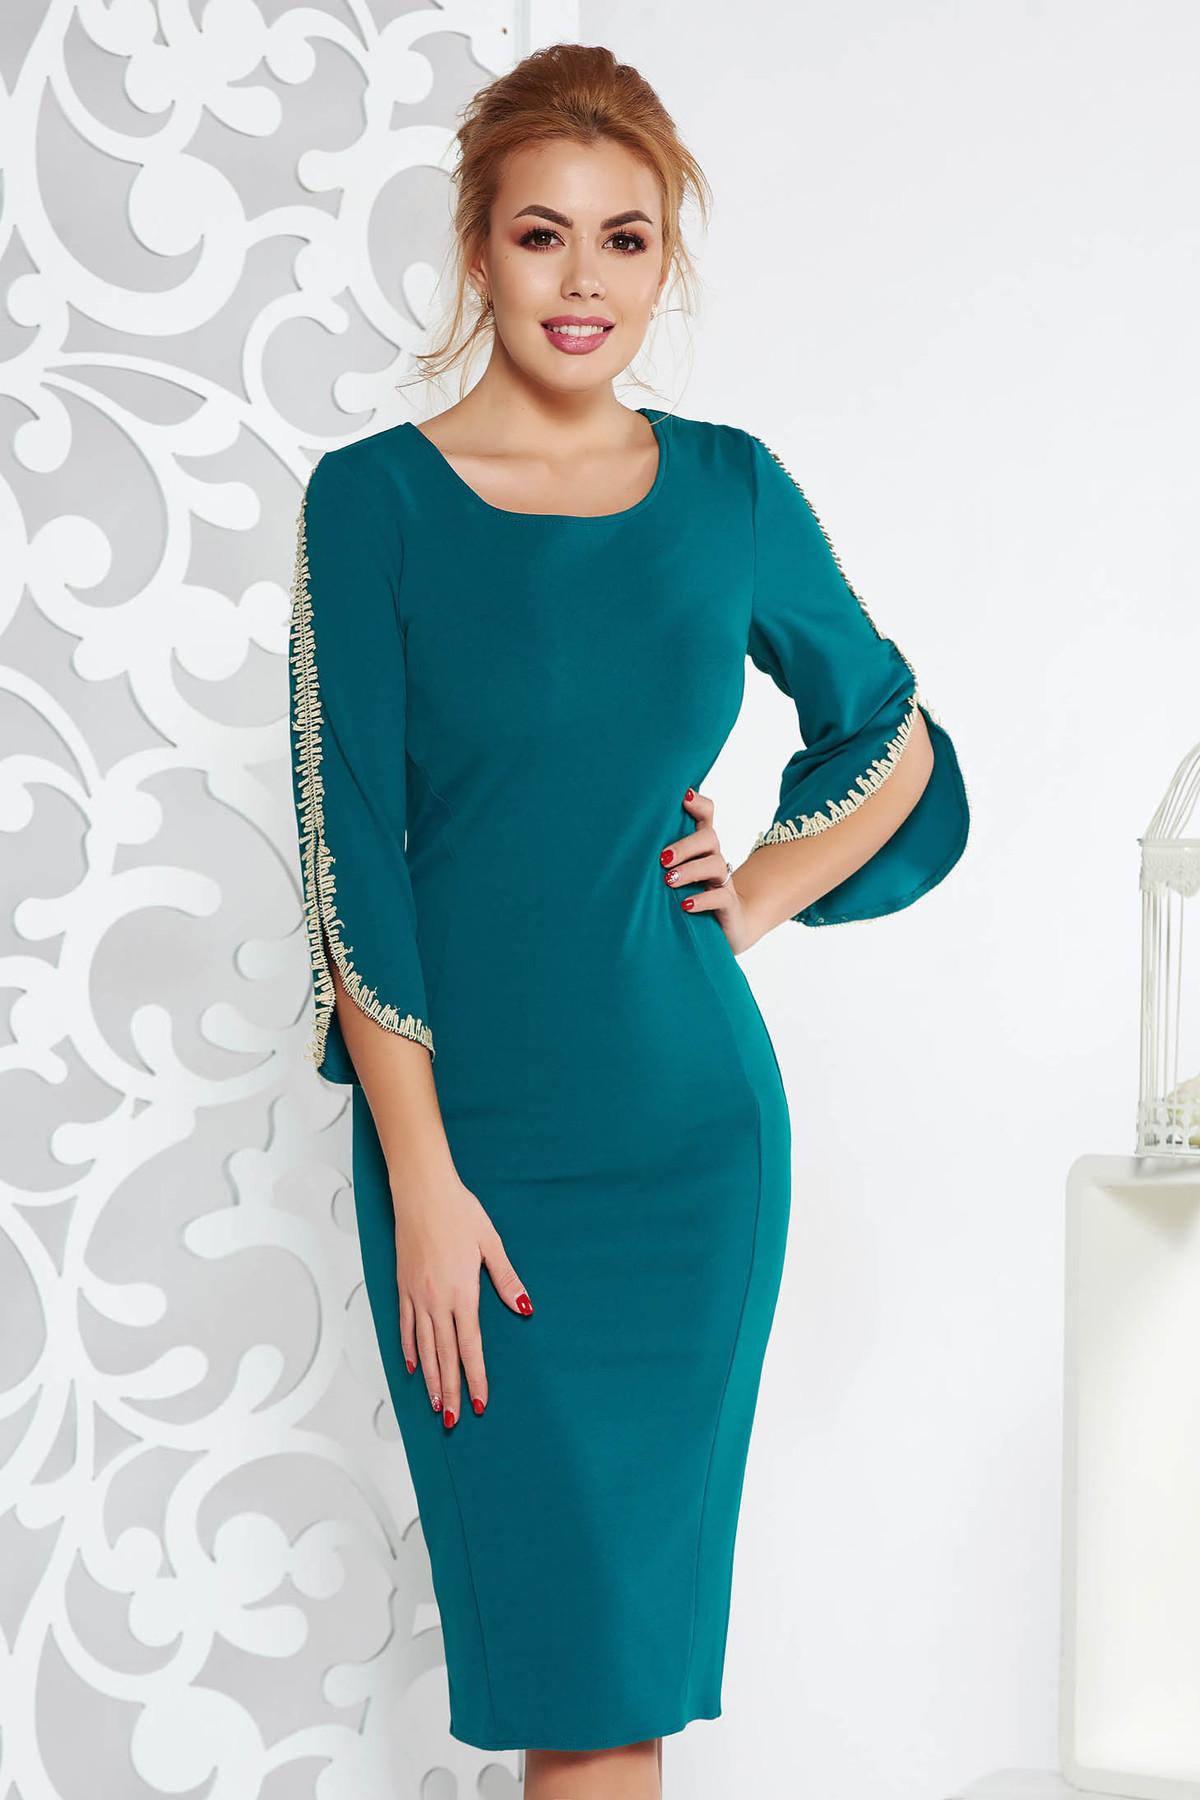 Rochie verde eleganta tip creion din material elastic cu insertii de broderie cu maneci trei-sferturi